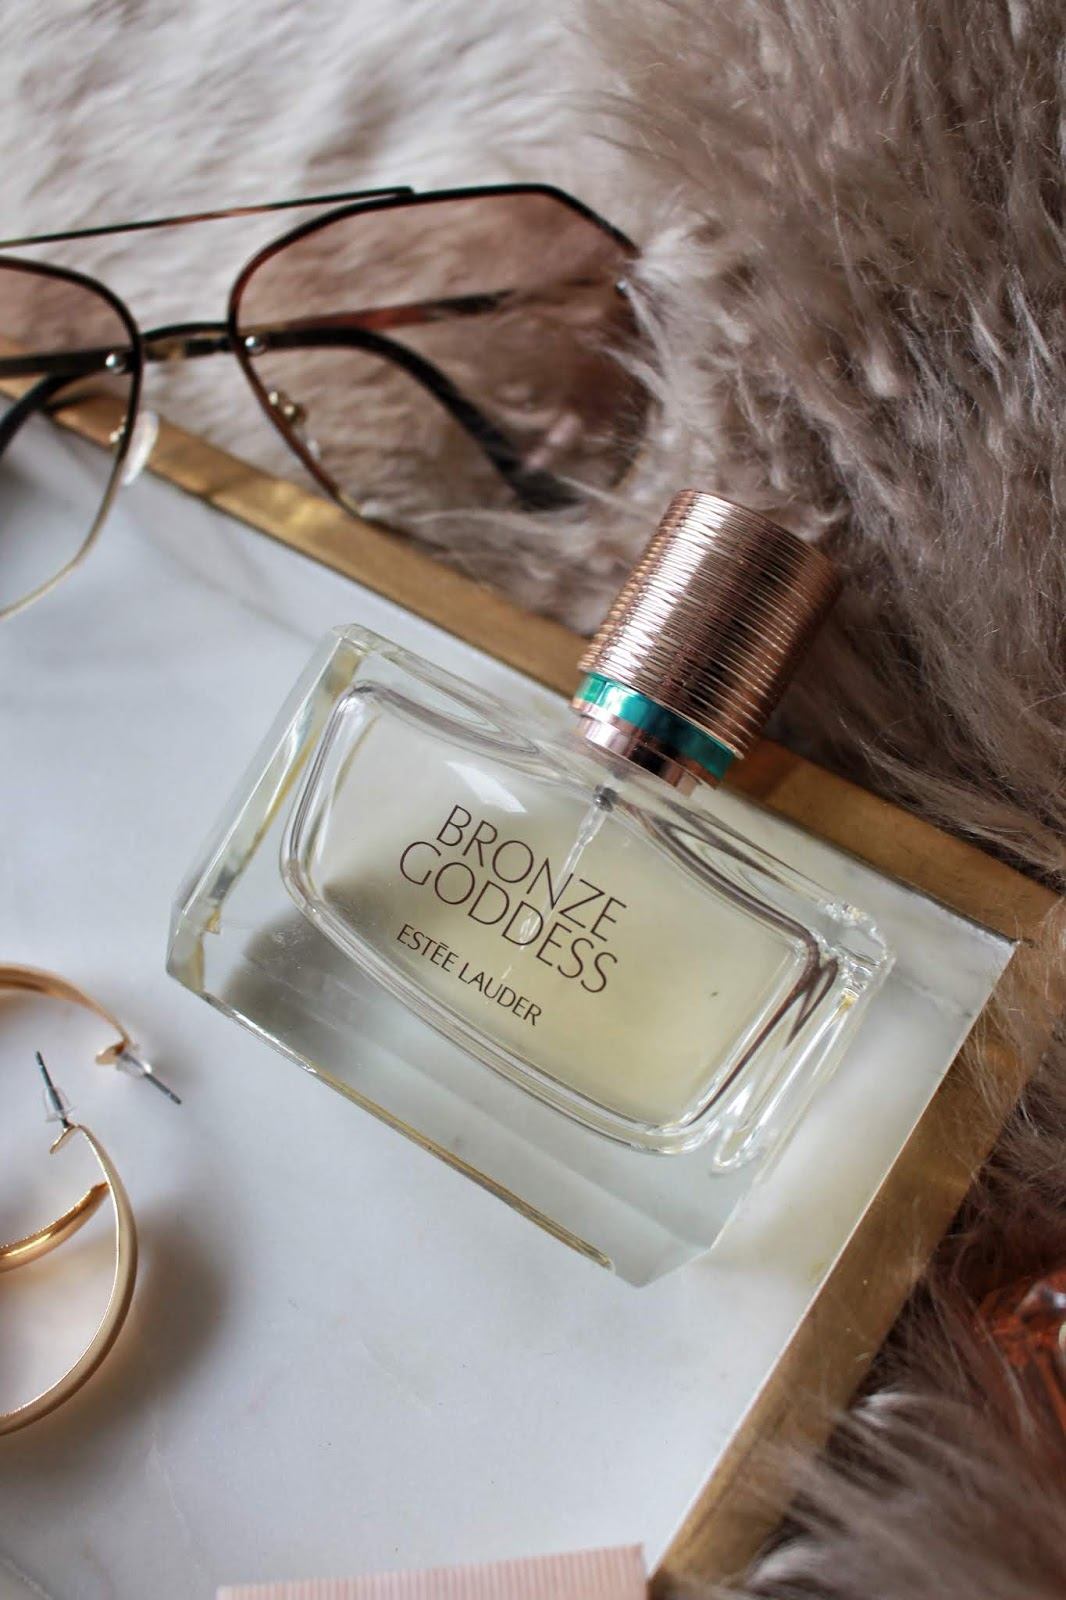 estee lauder review, estee lauder fragrance, estee lauder bronze goddess, esteelauder, estee lauder bronze goddess fragrance, the best summer fragrances, estee lauder bronze goddess 2020, estee lauder gwp, estee lauder free gift